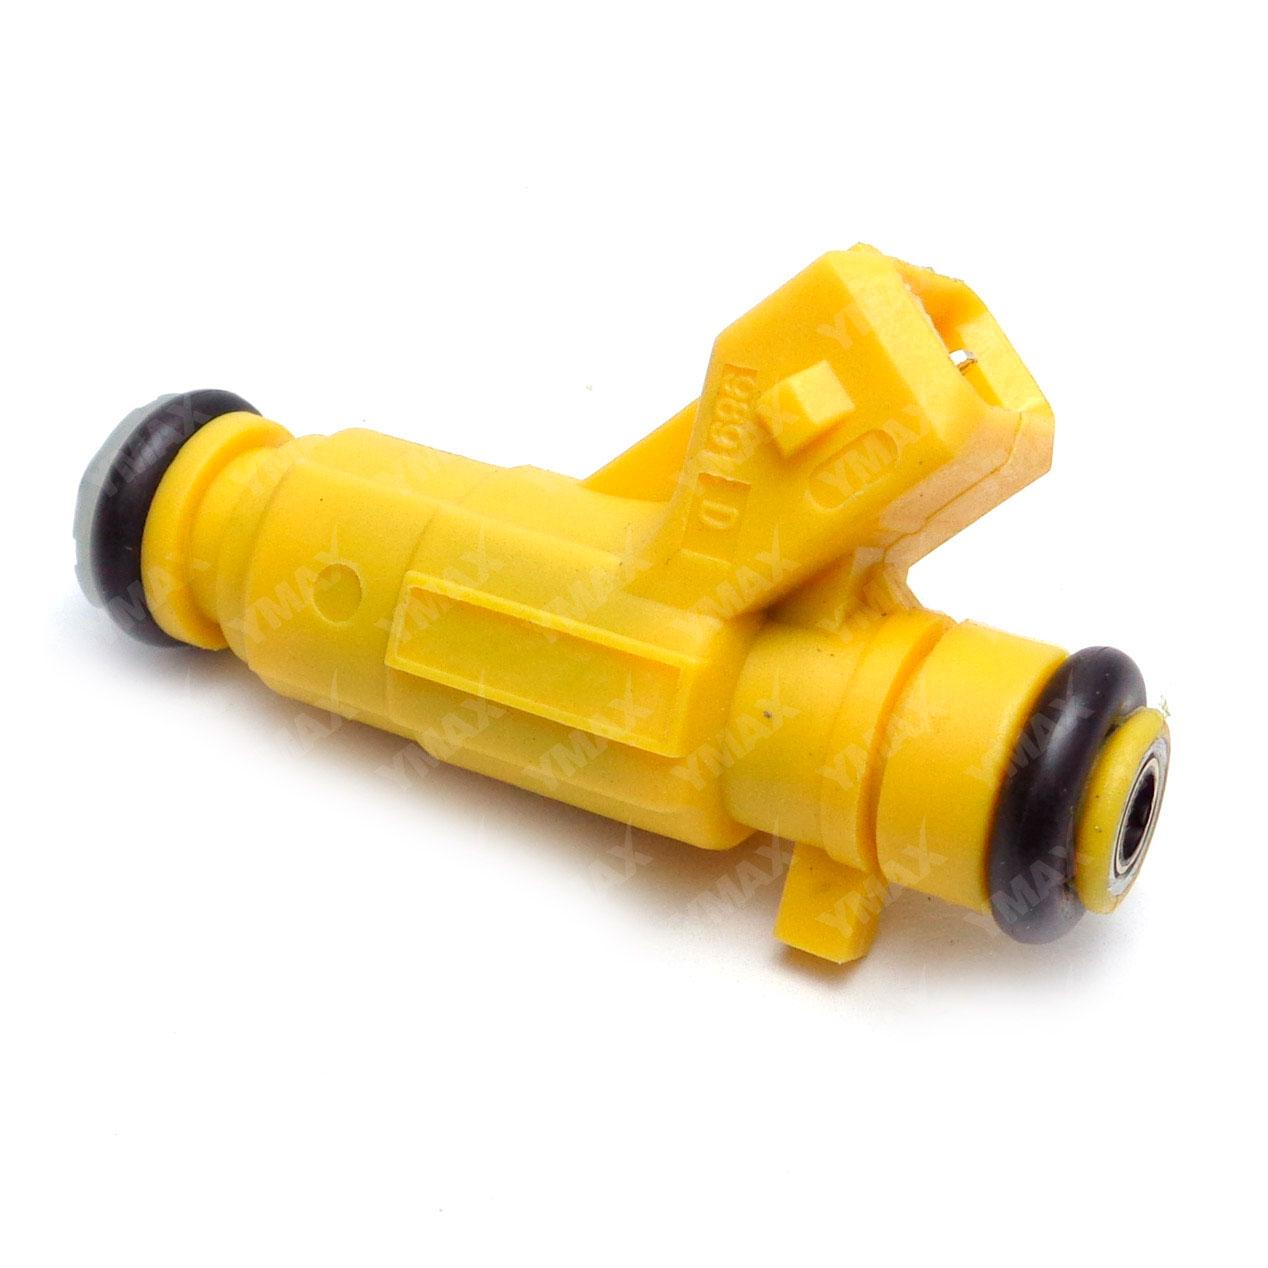 Bico Injetor de Combustível ASTRA BLAZER VECTRA (BIW086)